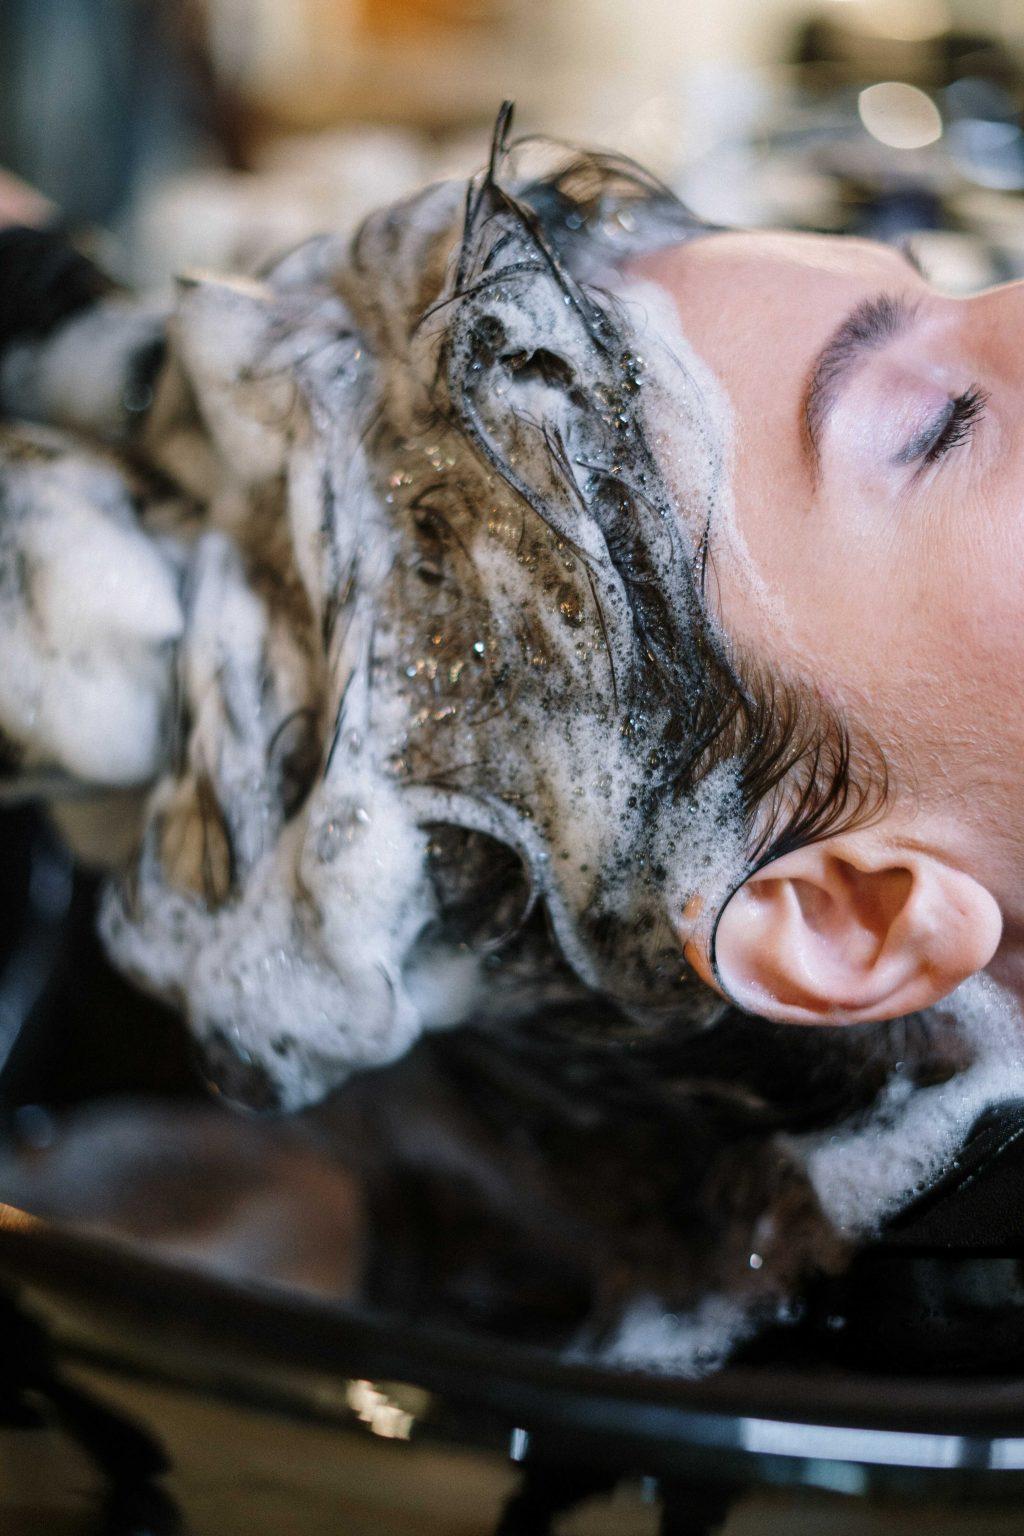 Lựa chọn sản phẩm phù hợp giúp chăm sóc tóc lão hóa.